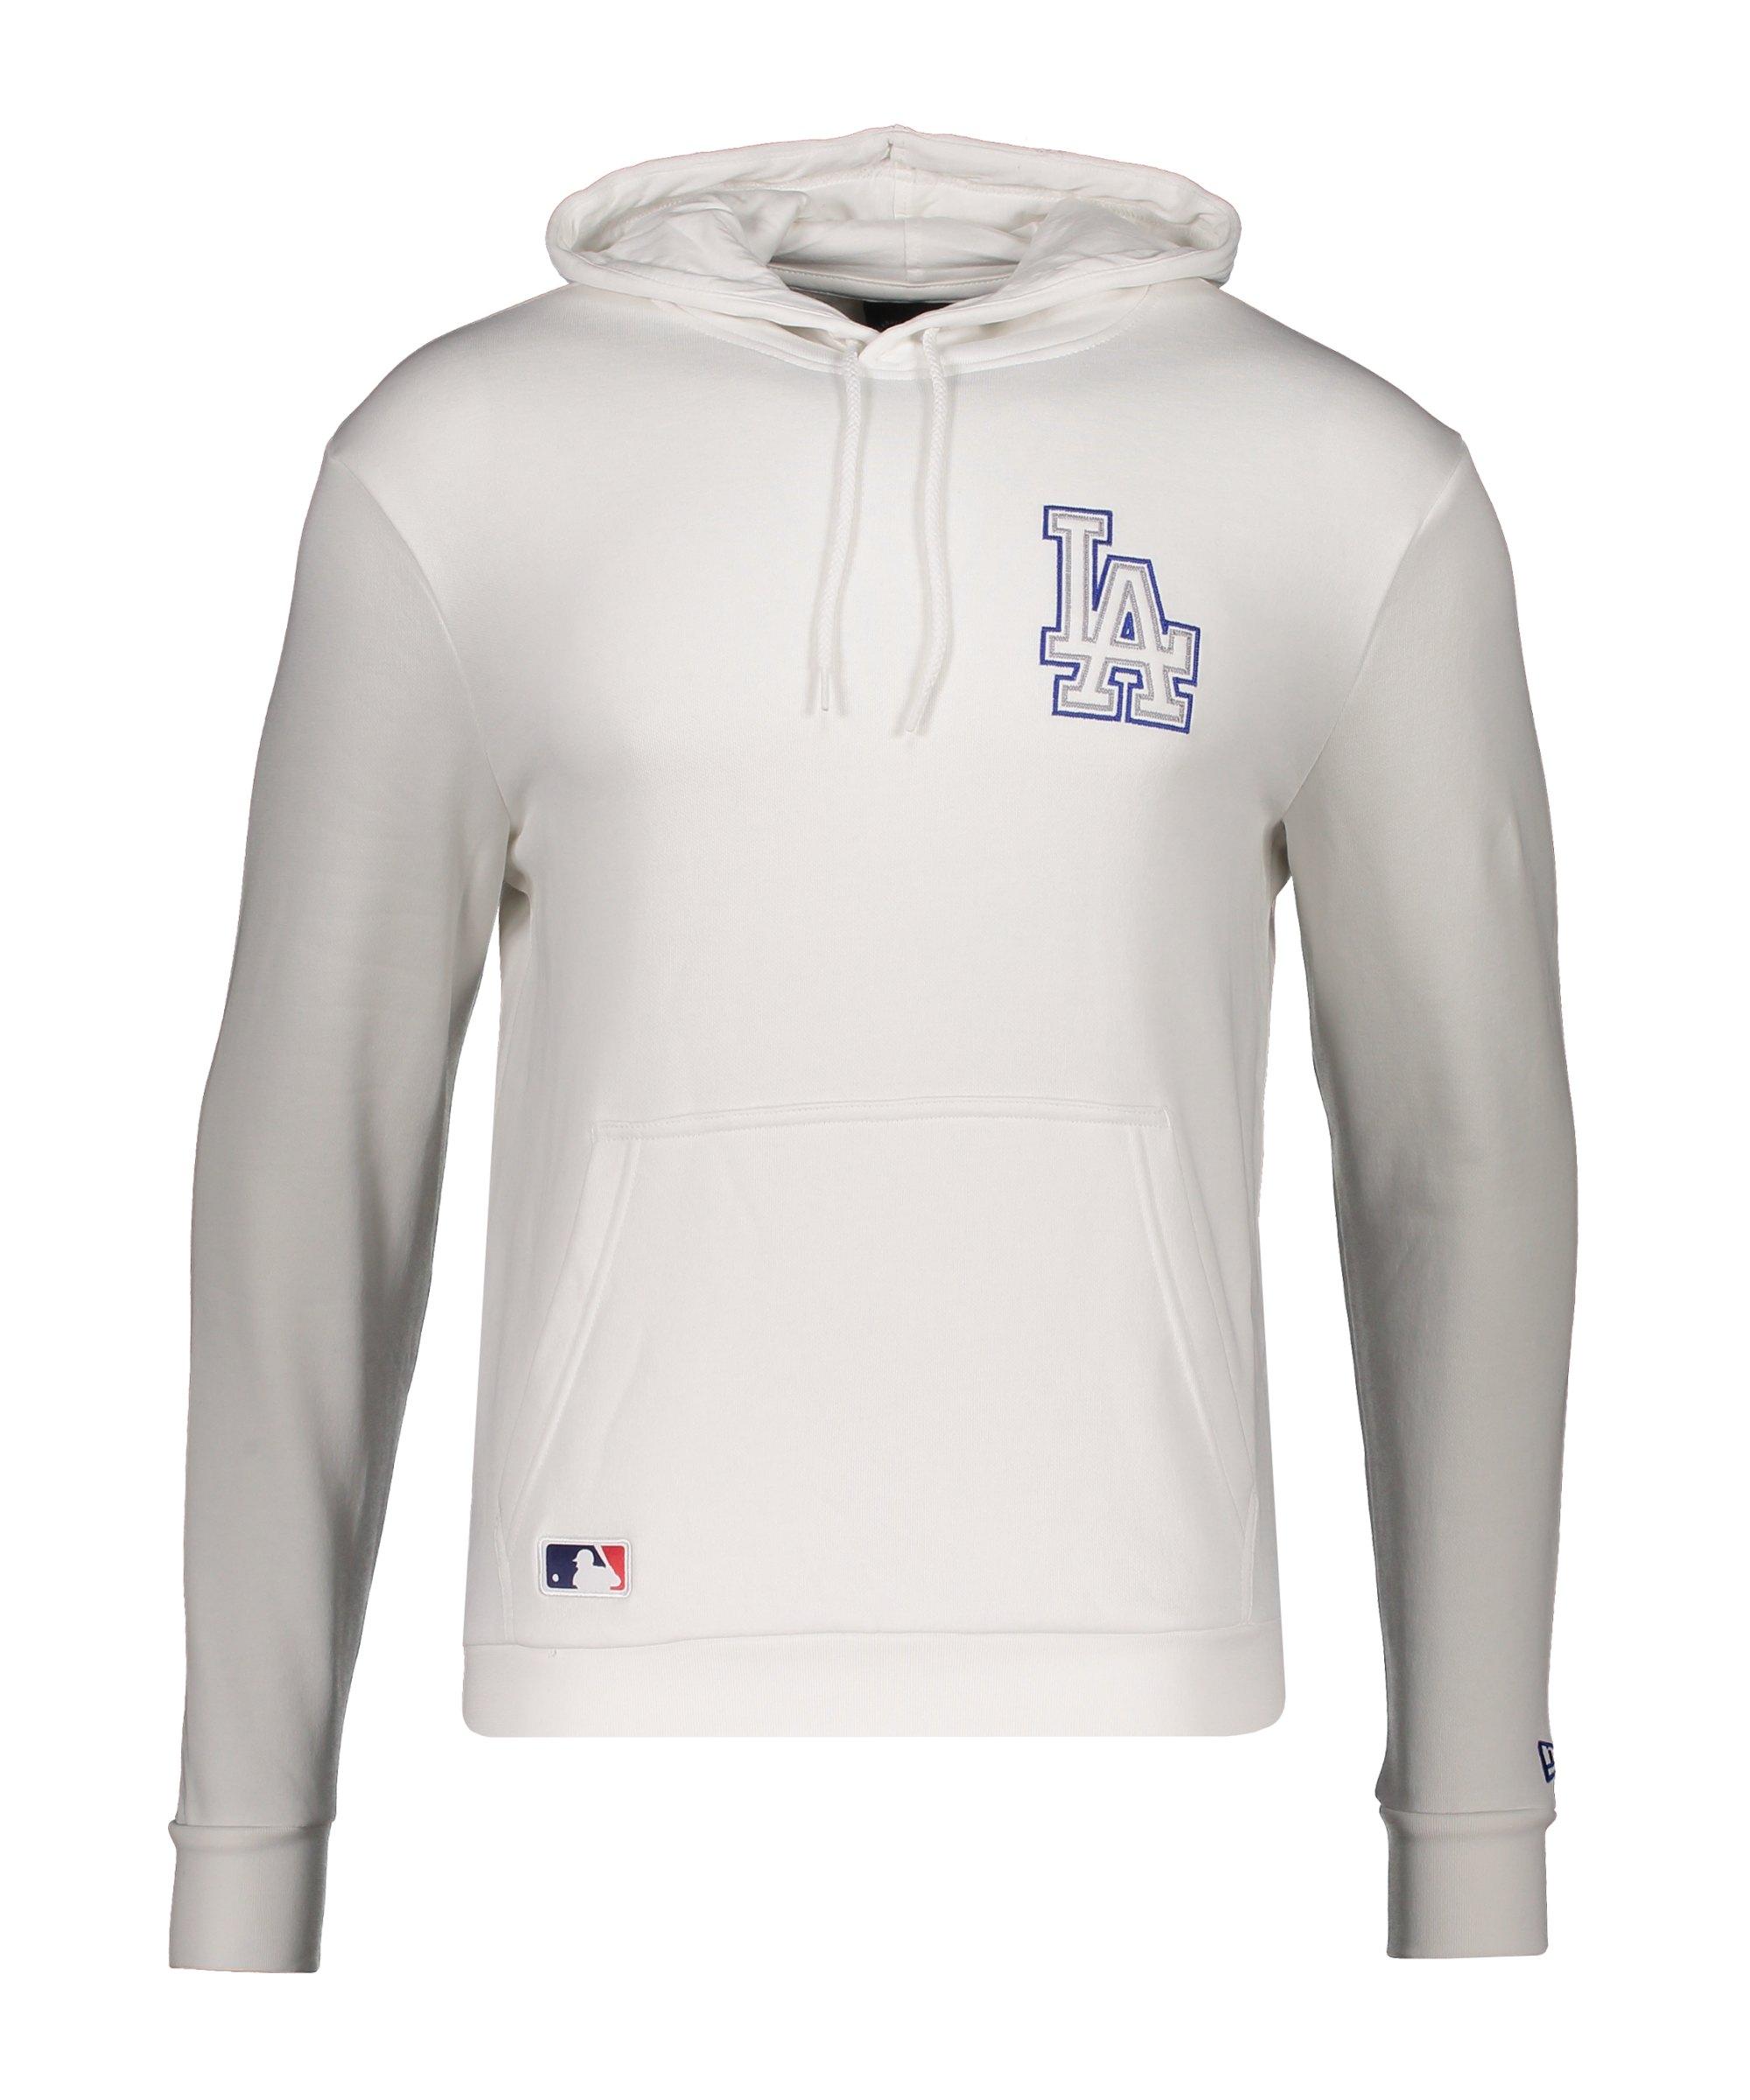 New Era LA Dodgers Chain Stitch Hoody Weiss FWHI - weiss